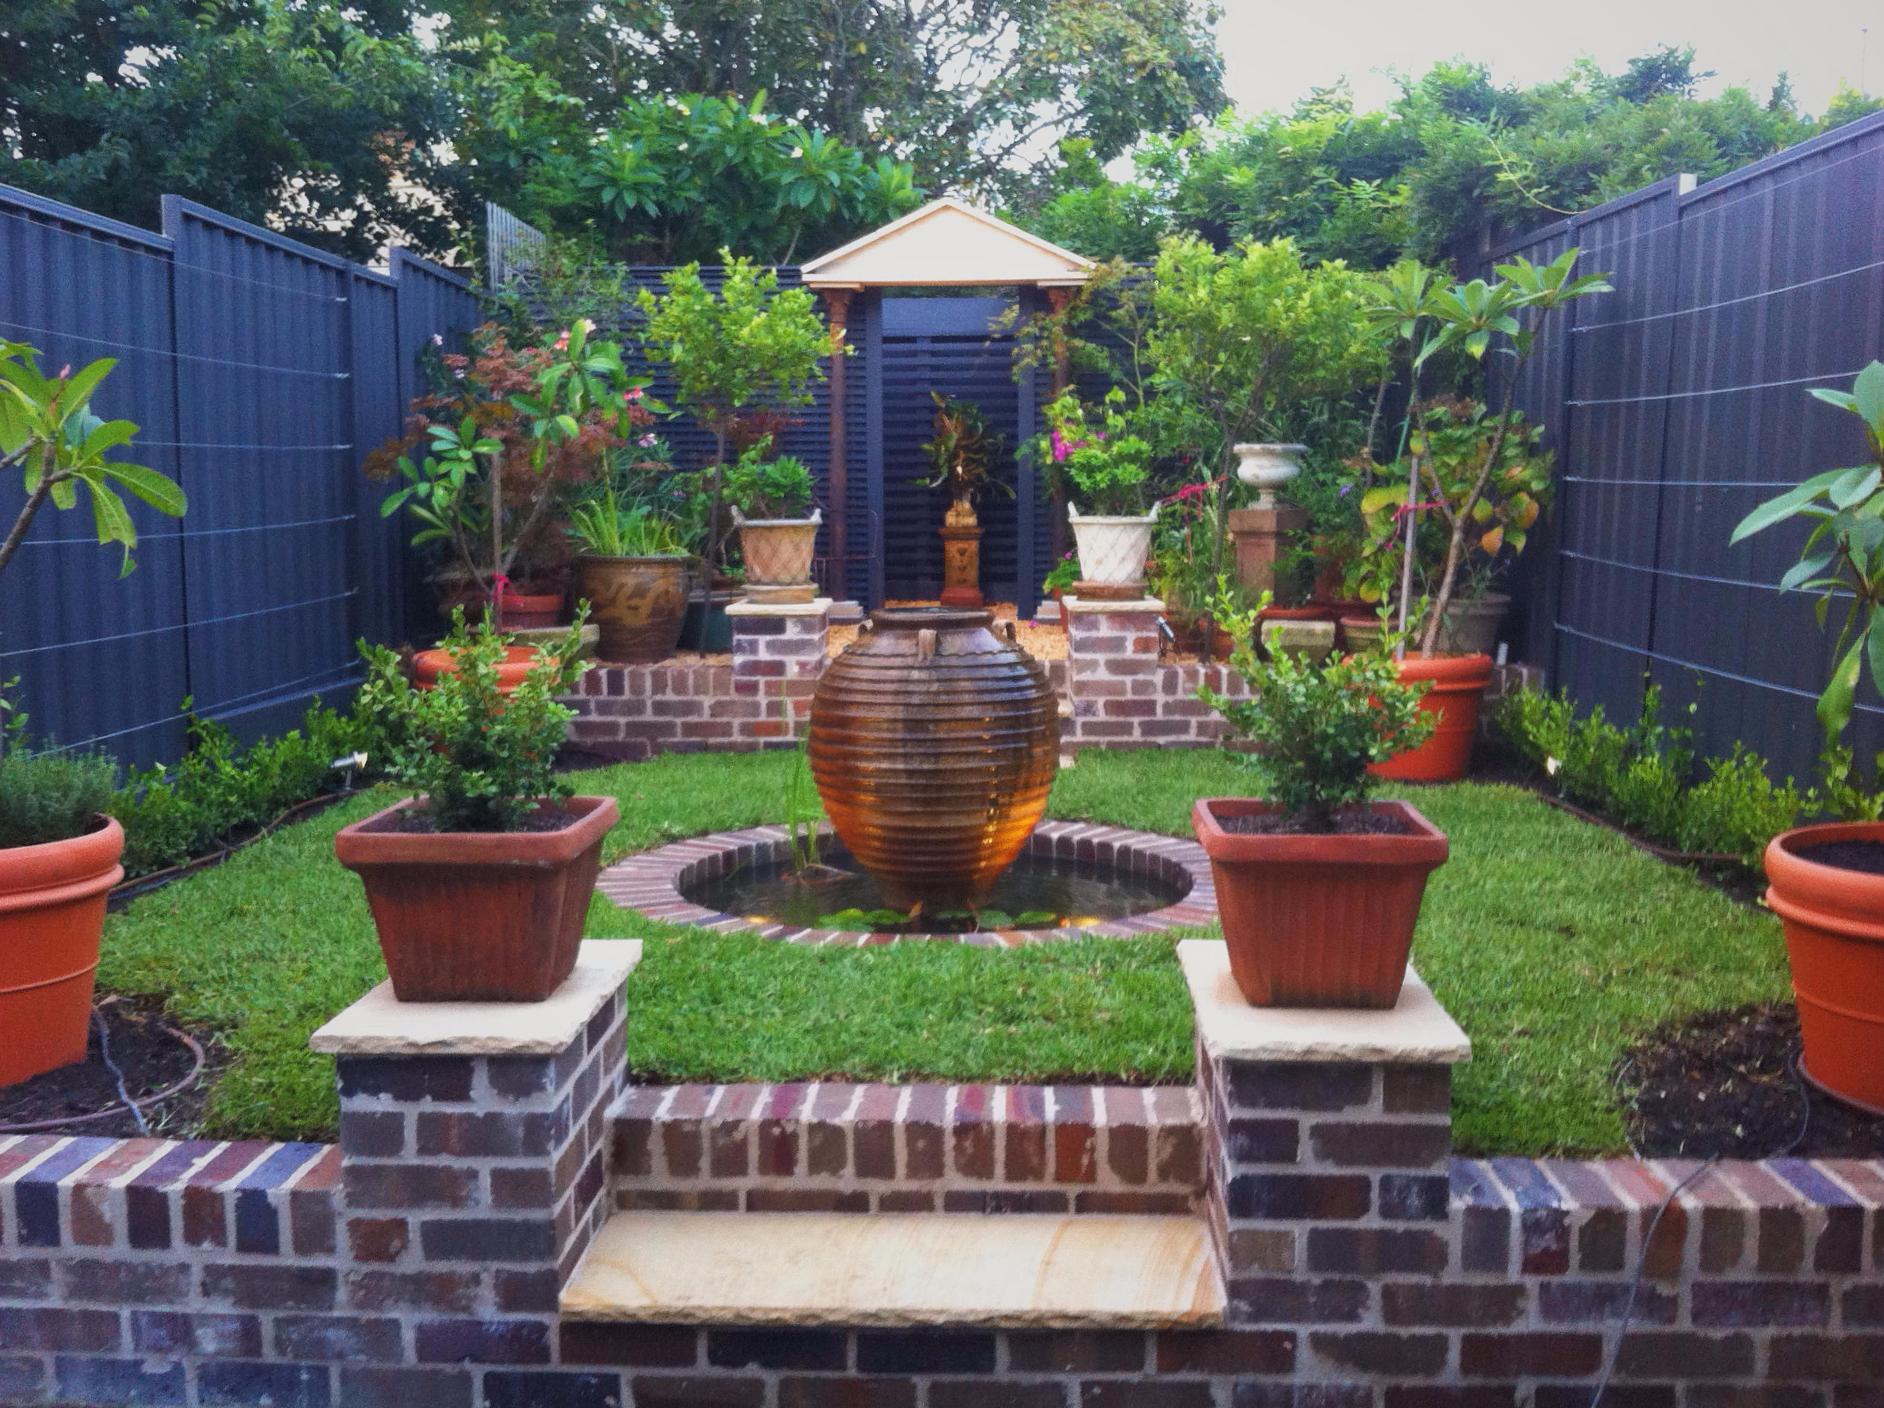 Ornate Gardening